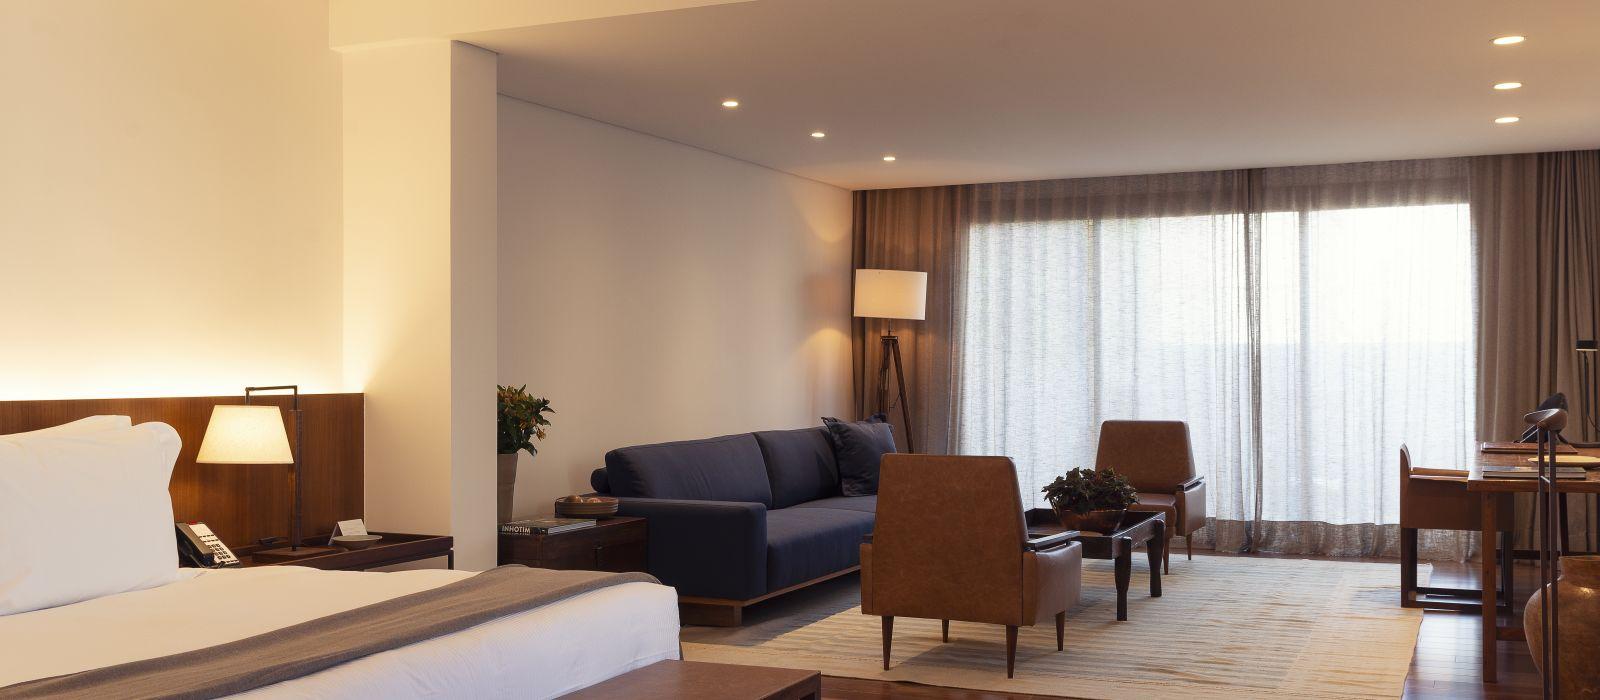 Hotel Fasano Belo Horizonte Brasilien